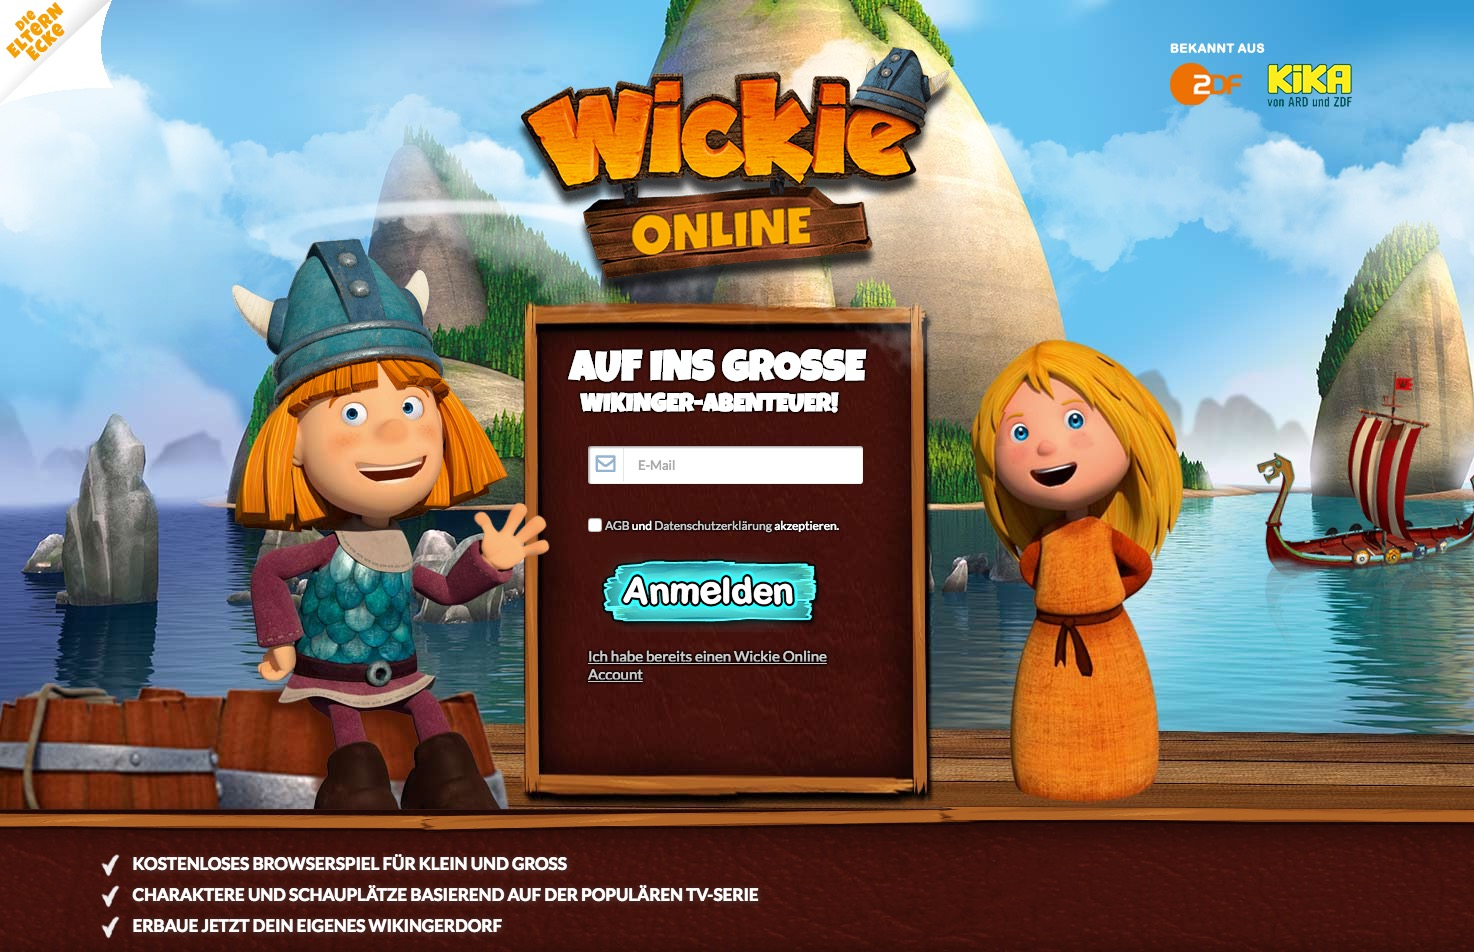 Wickie Online Game